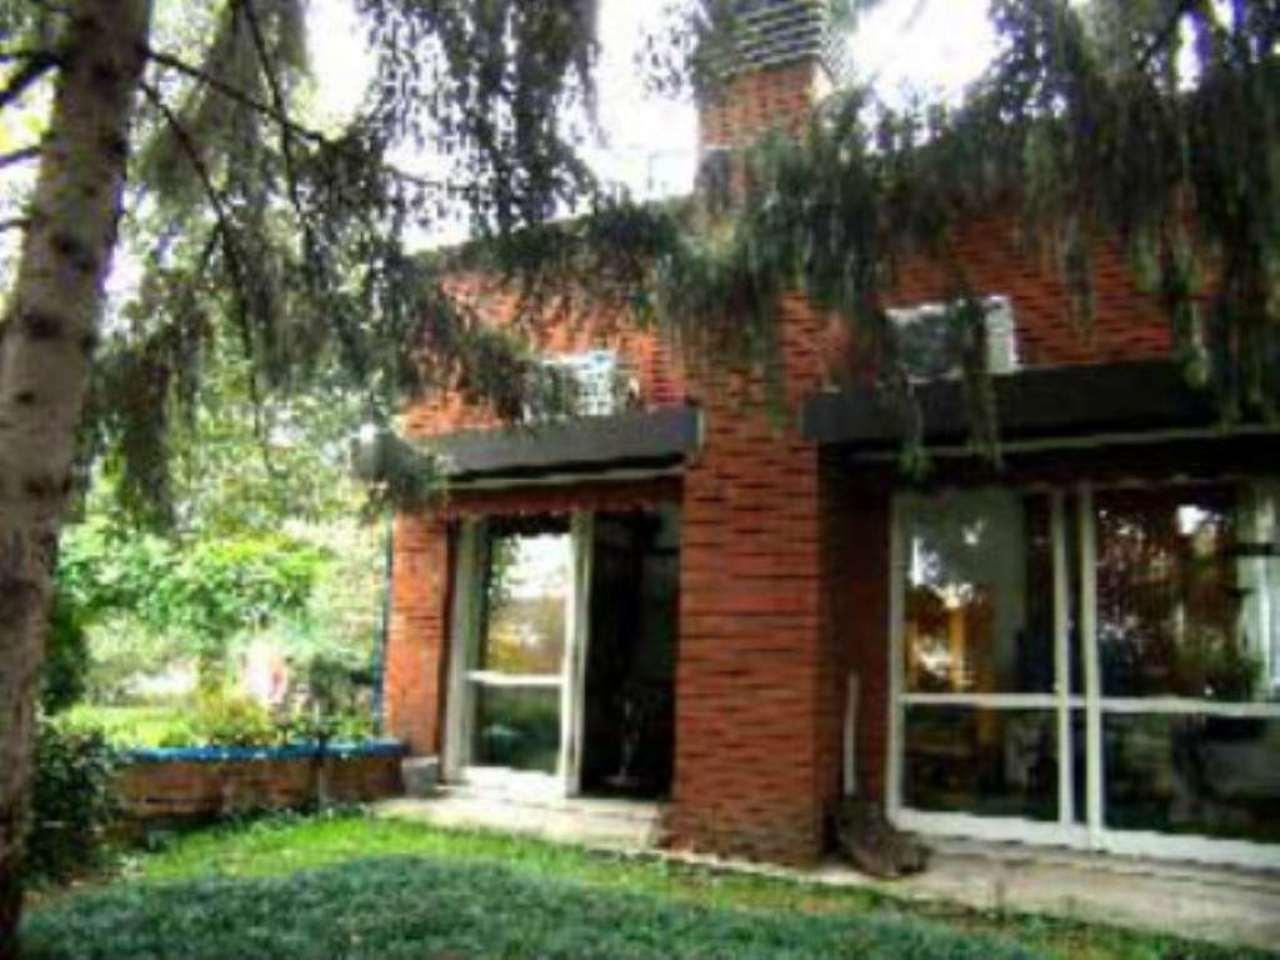 Villa in Vendita a Segrate: 5 locali, 170 mq - Foto 2